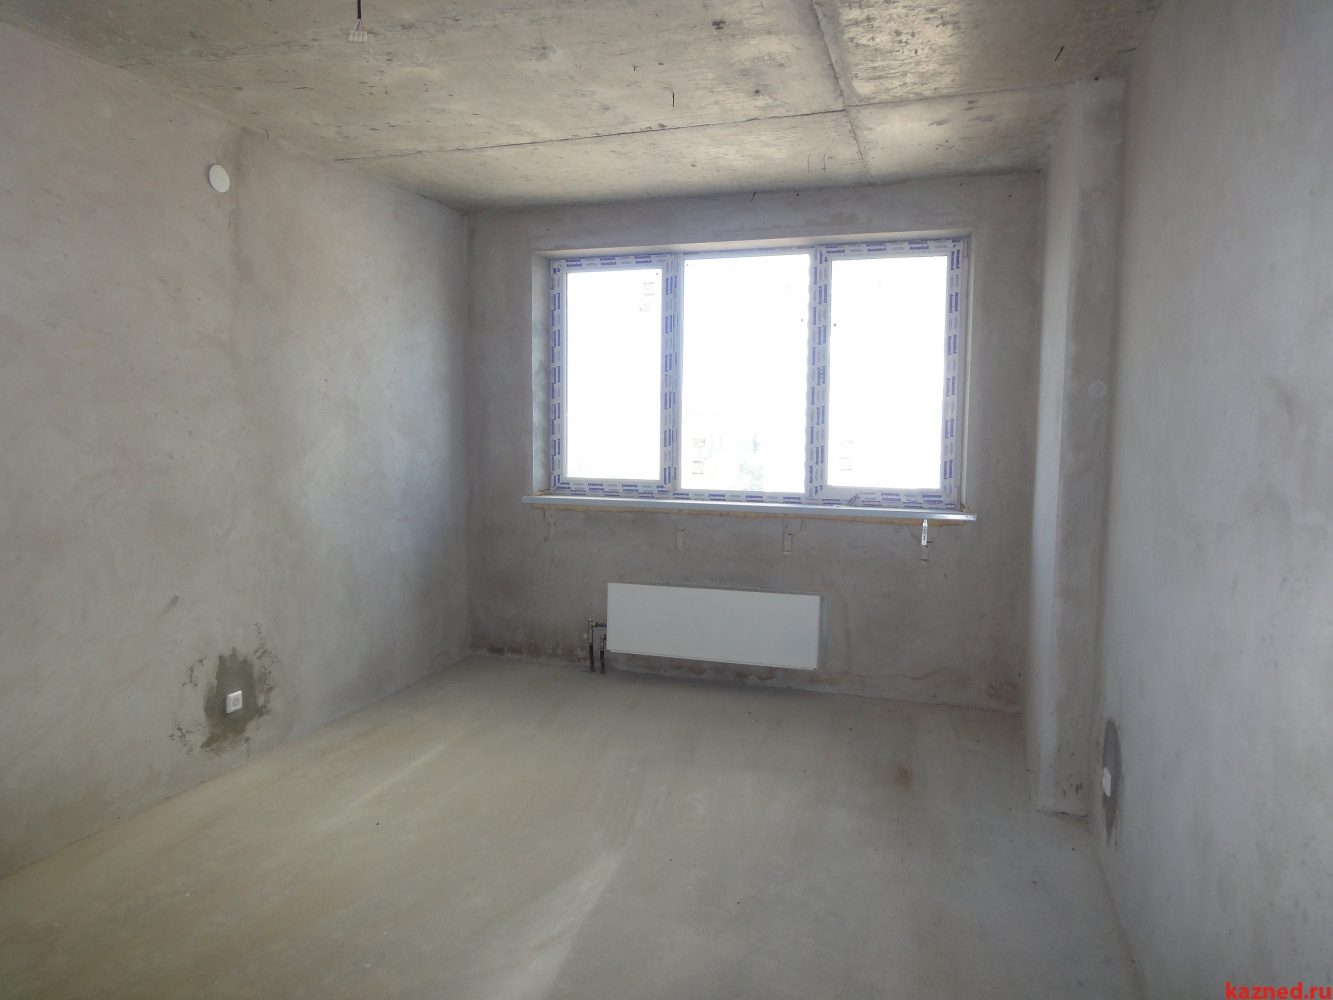 Продам 2-комн.квартиру Рихарда Зорге д.66, ЖК Олимп, 62 м2  (миниатюра №3)